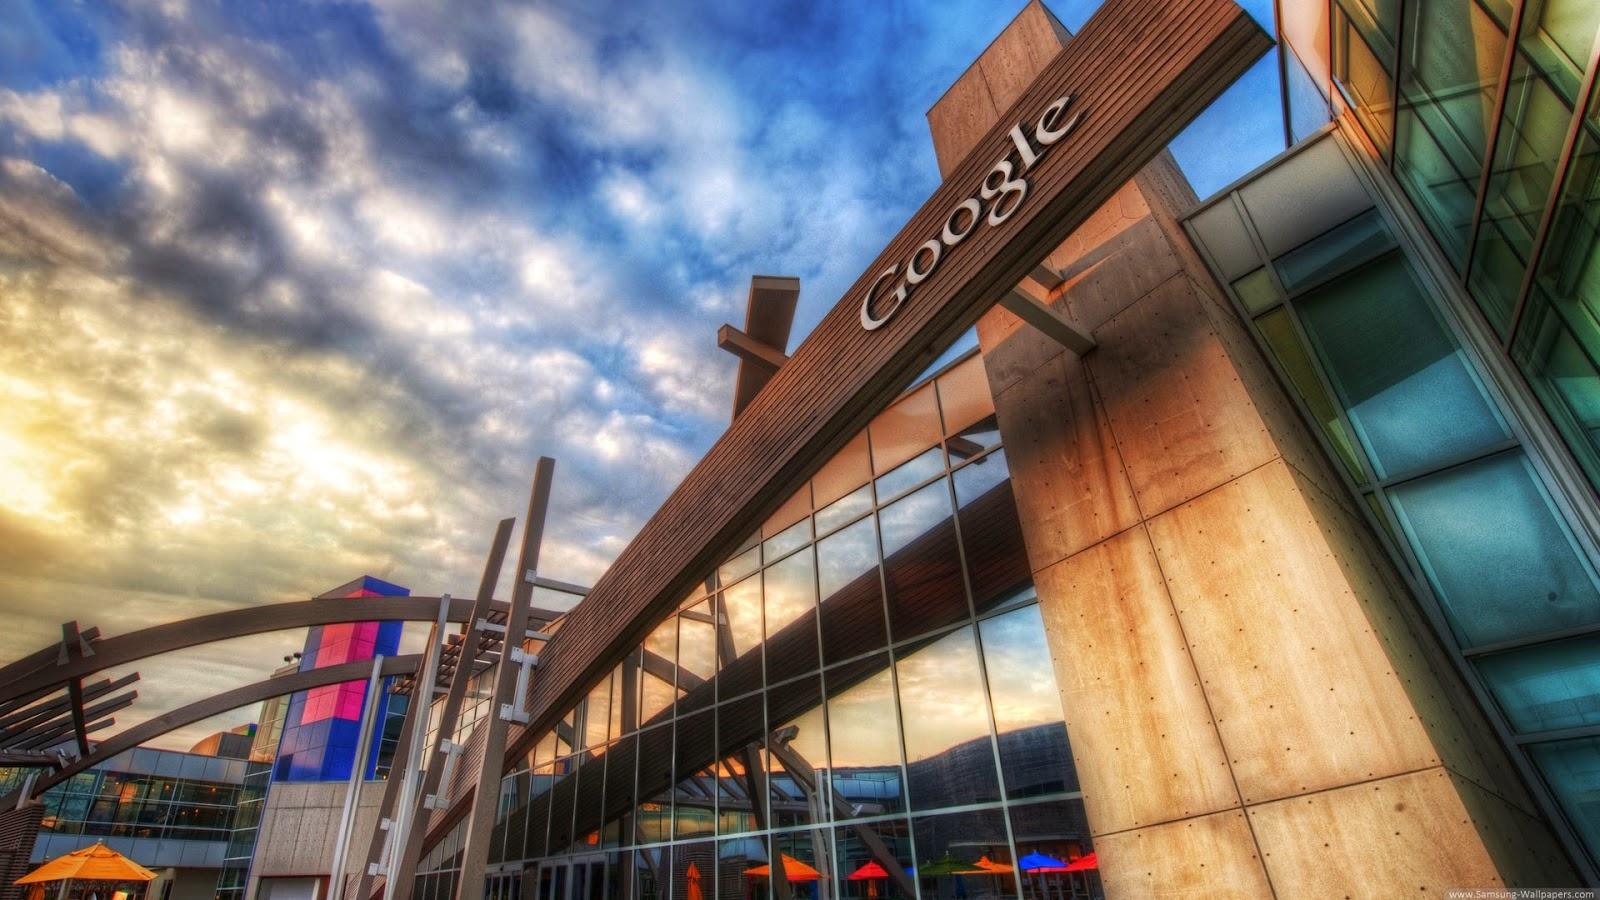 Silicon Valley Tech Tours Visit San Jose